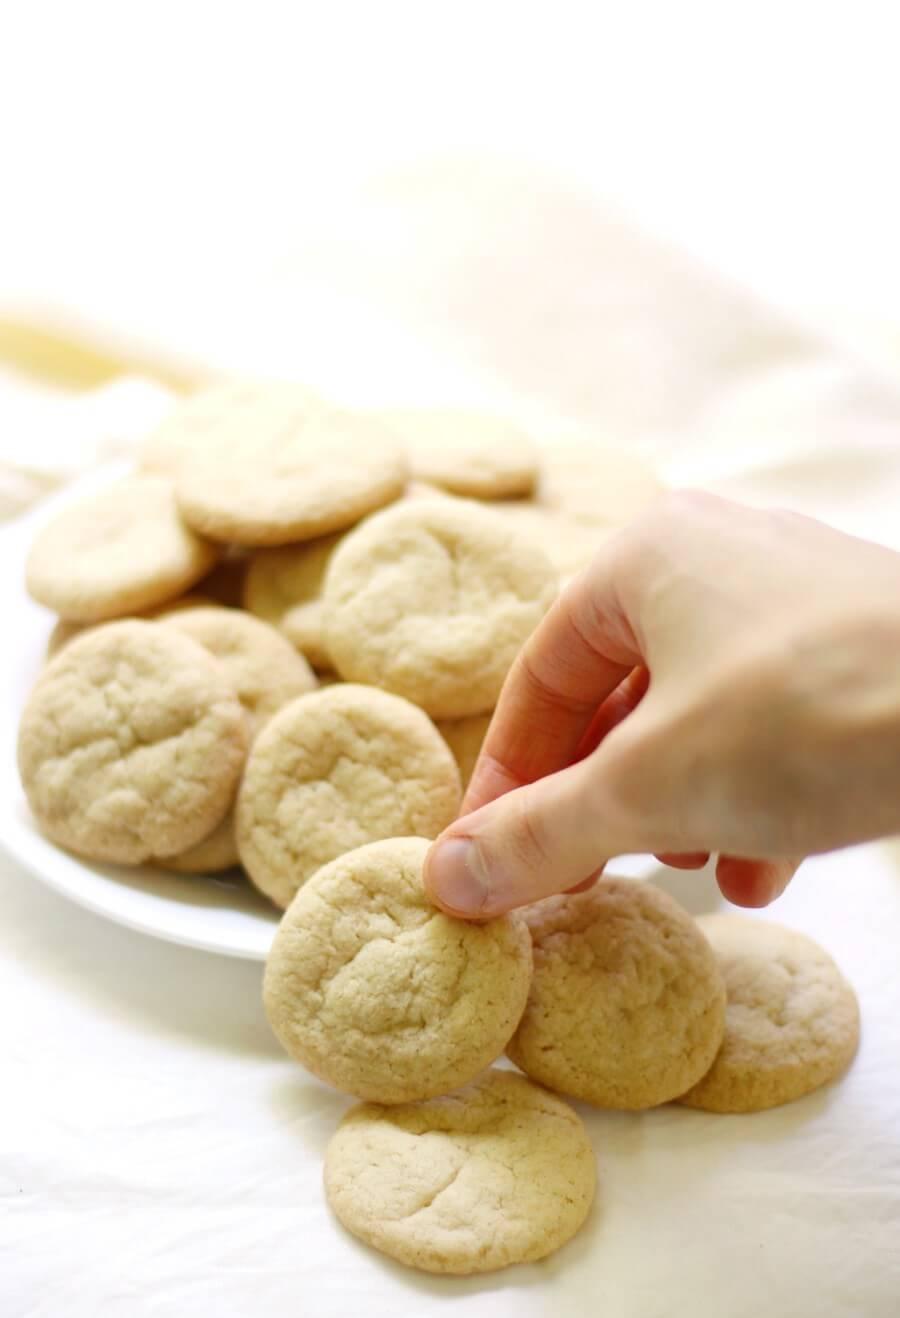 hand grabbing a gluten-free homemade vanilla wafer